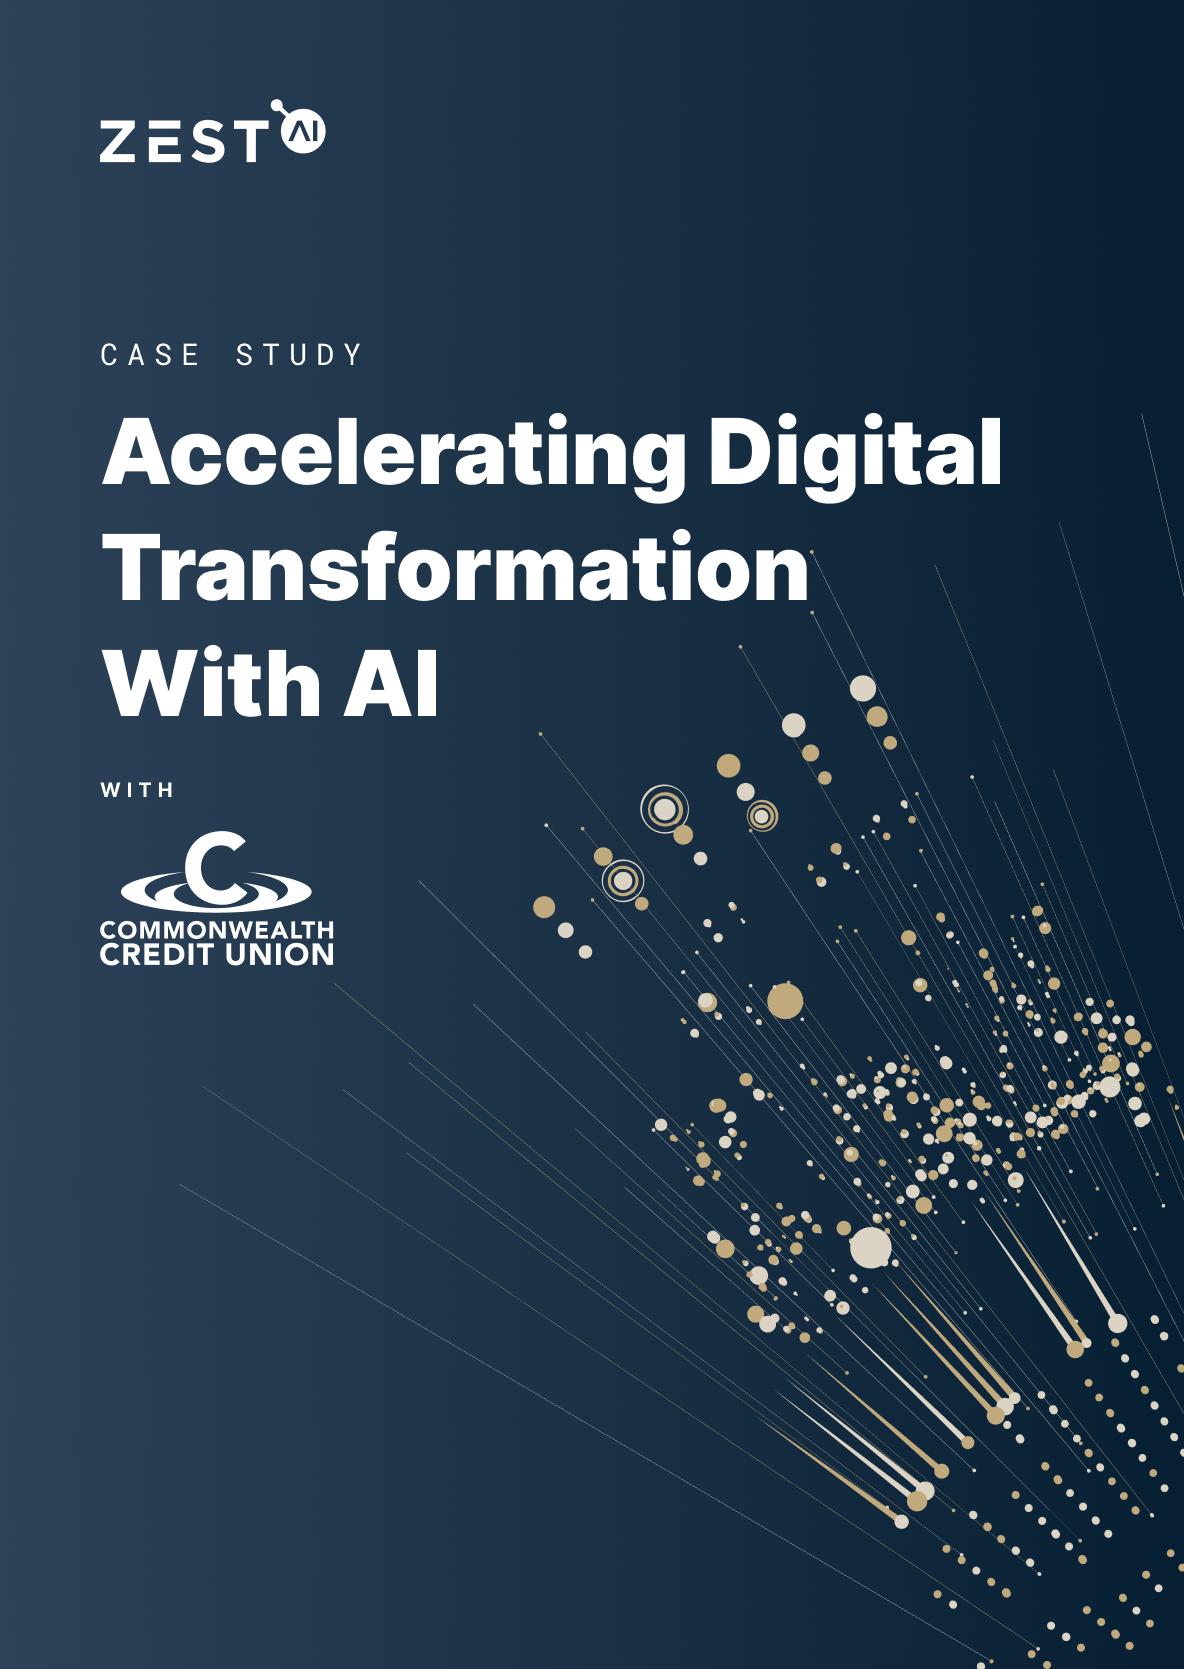 Case Study: Accelerating Digital Transformation